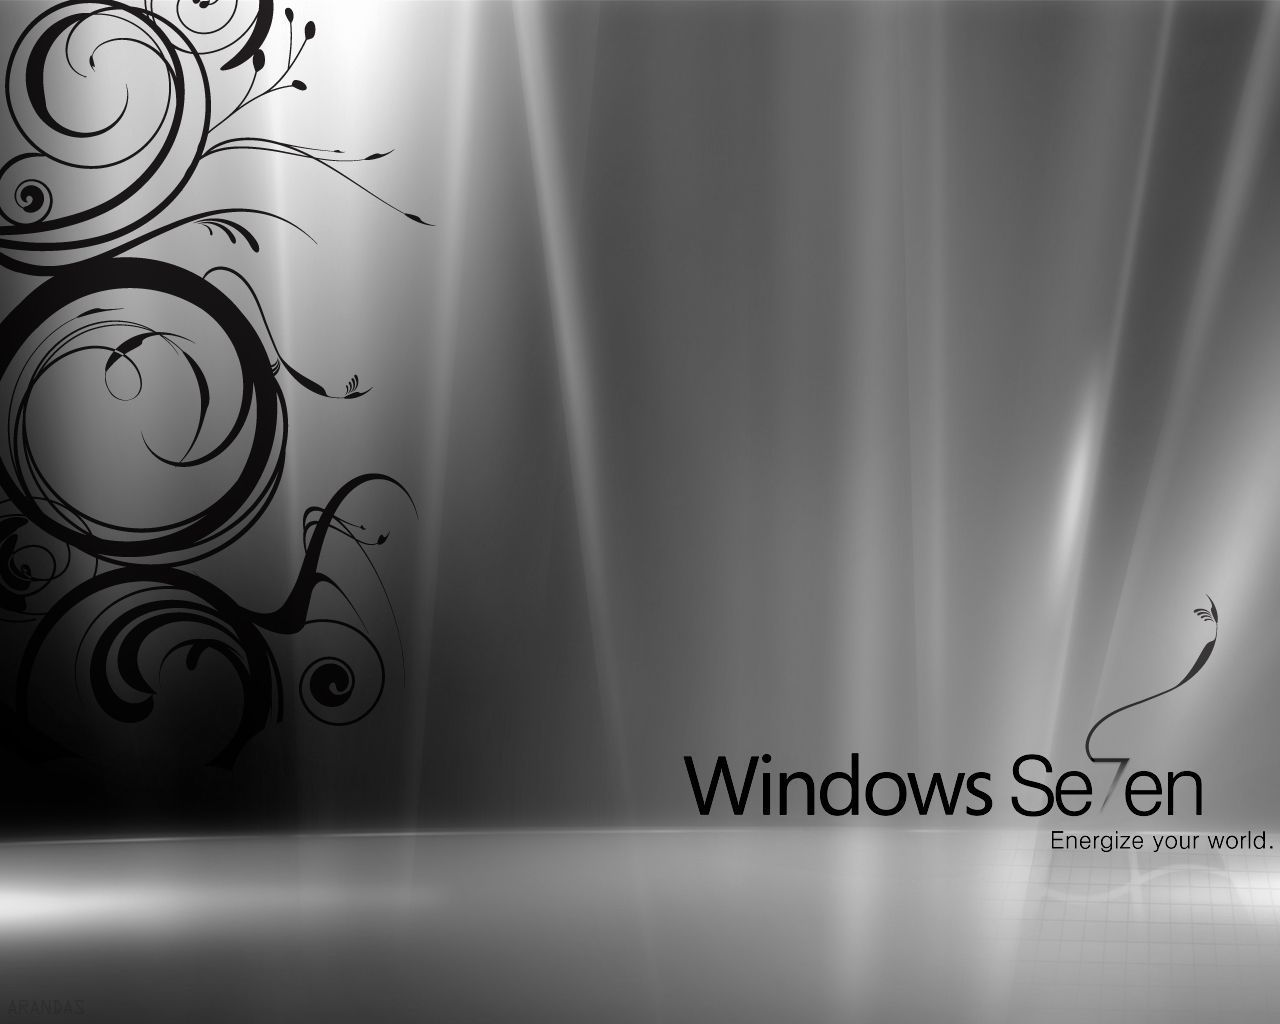 download windows vista ultimate wallpaper series pack . | wallpapers